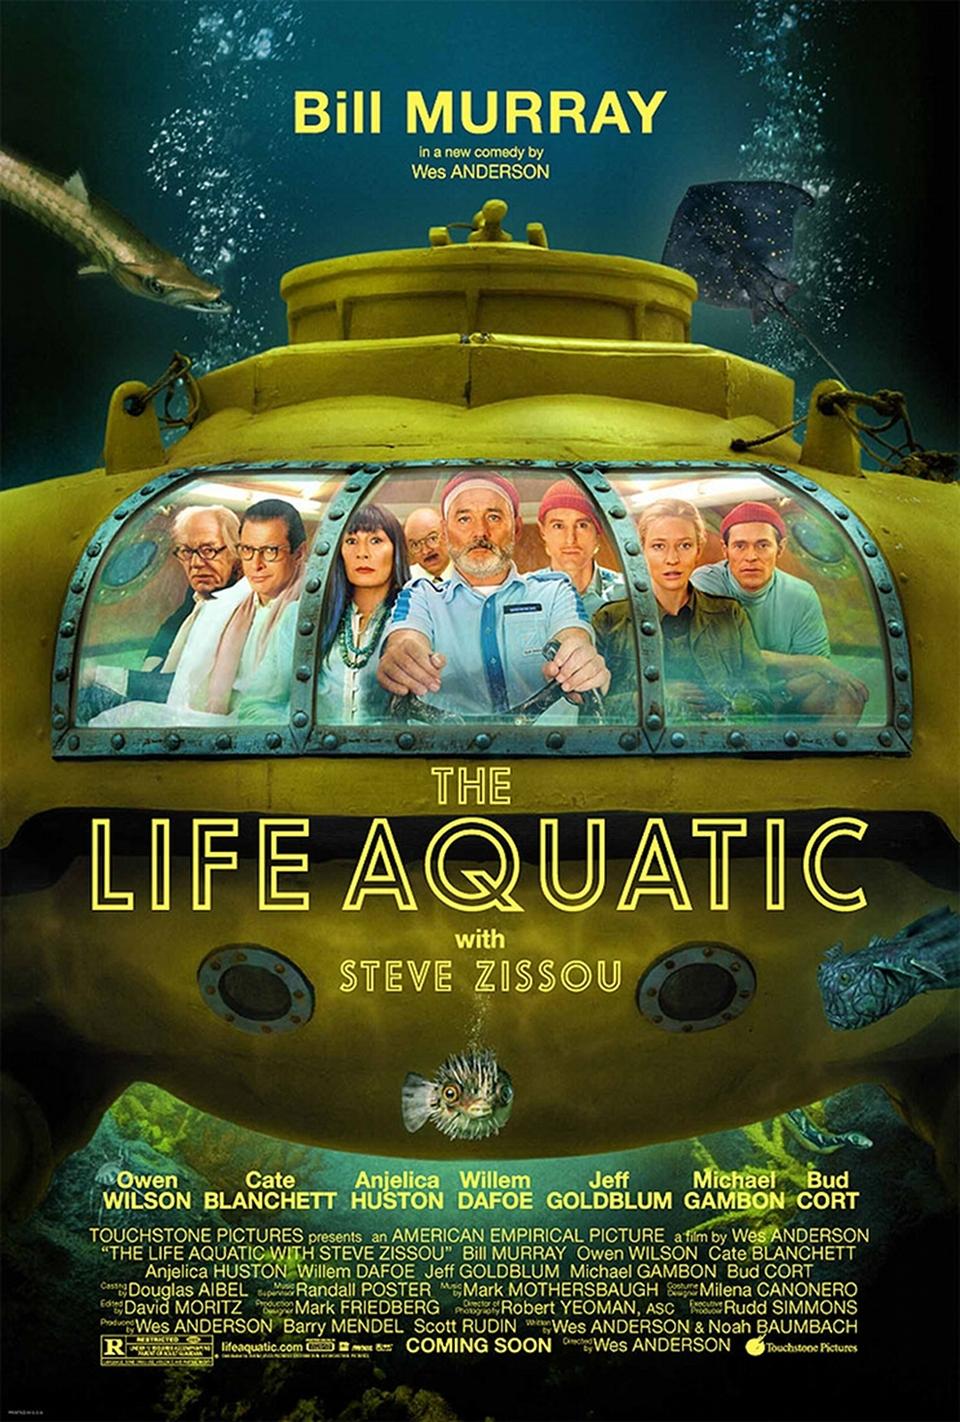 001-life-aquatic-estados-unidos.jpg